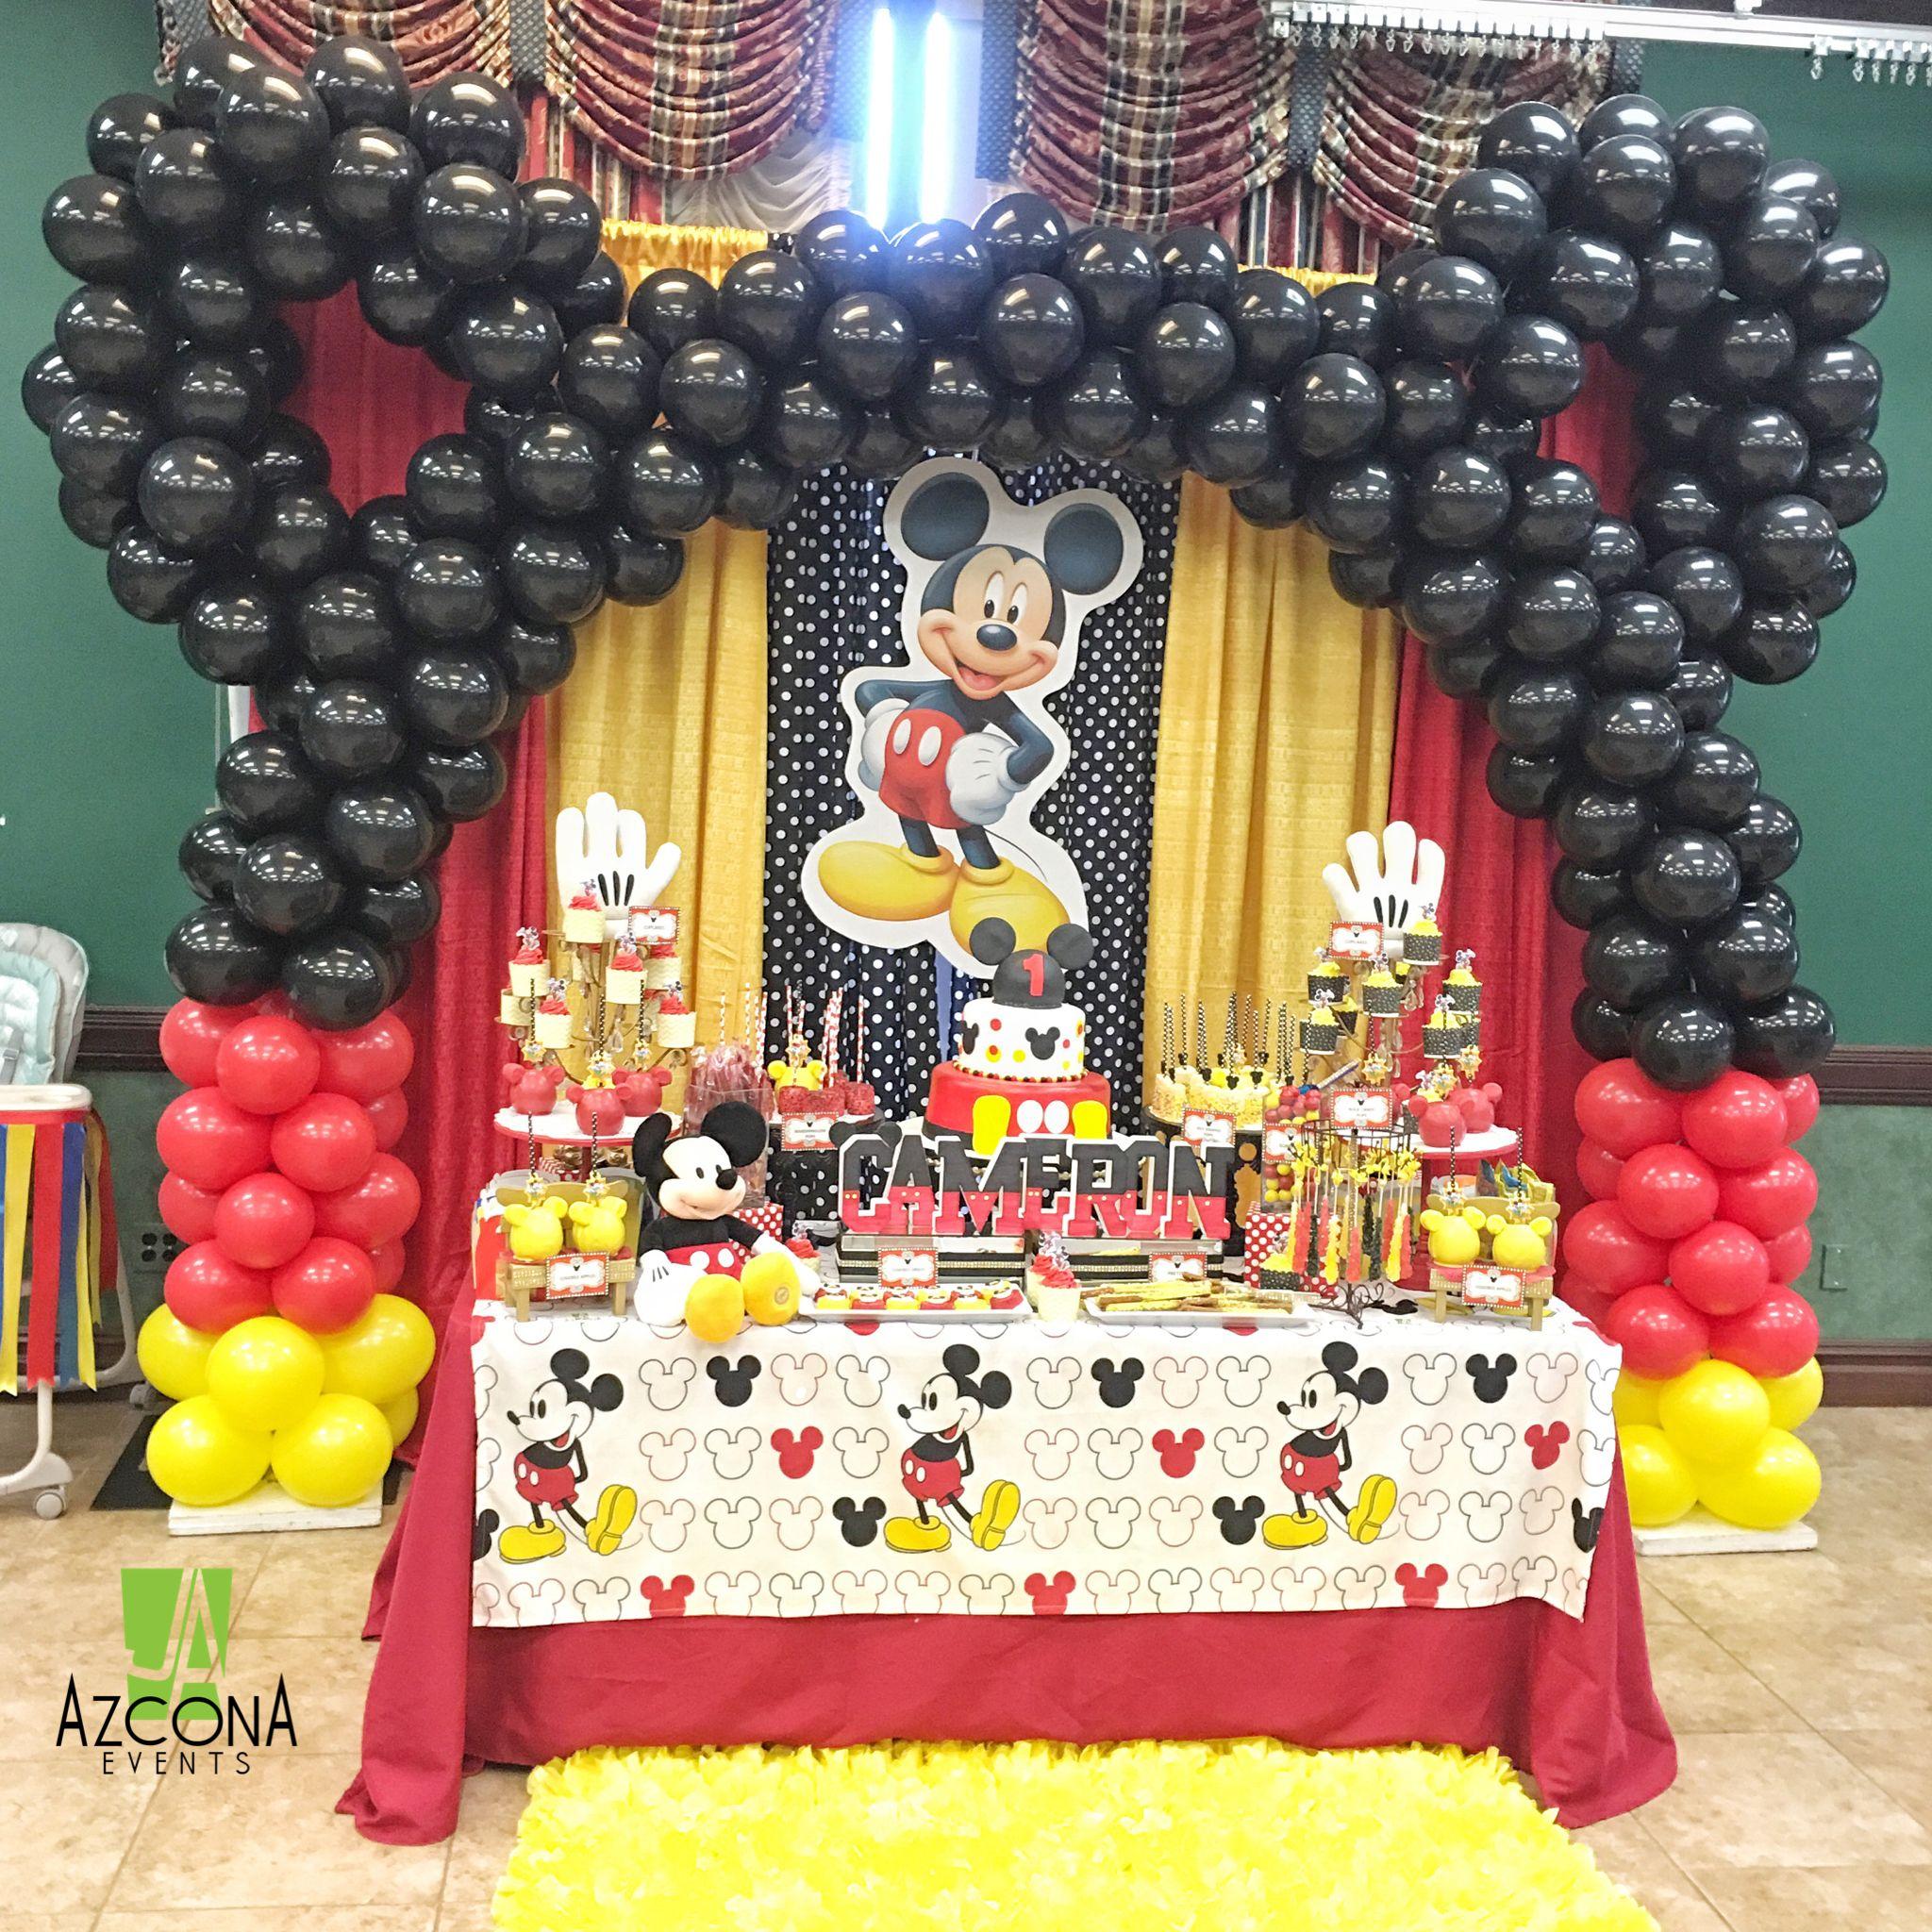 Mickey Themed 1st Birthday By Us Azconaevents Balloons Mickey Mouse Birthday Decorations Mickey Mouse First Birthday Mickey Mouse Party Decorations